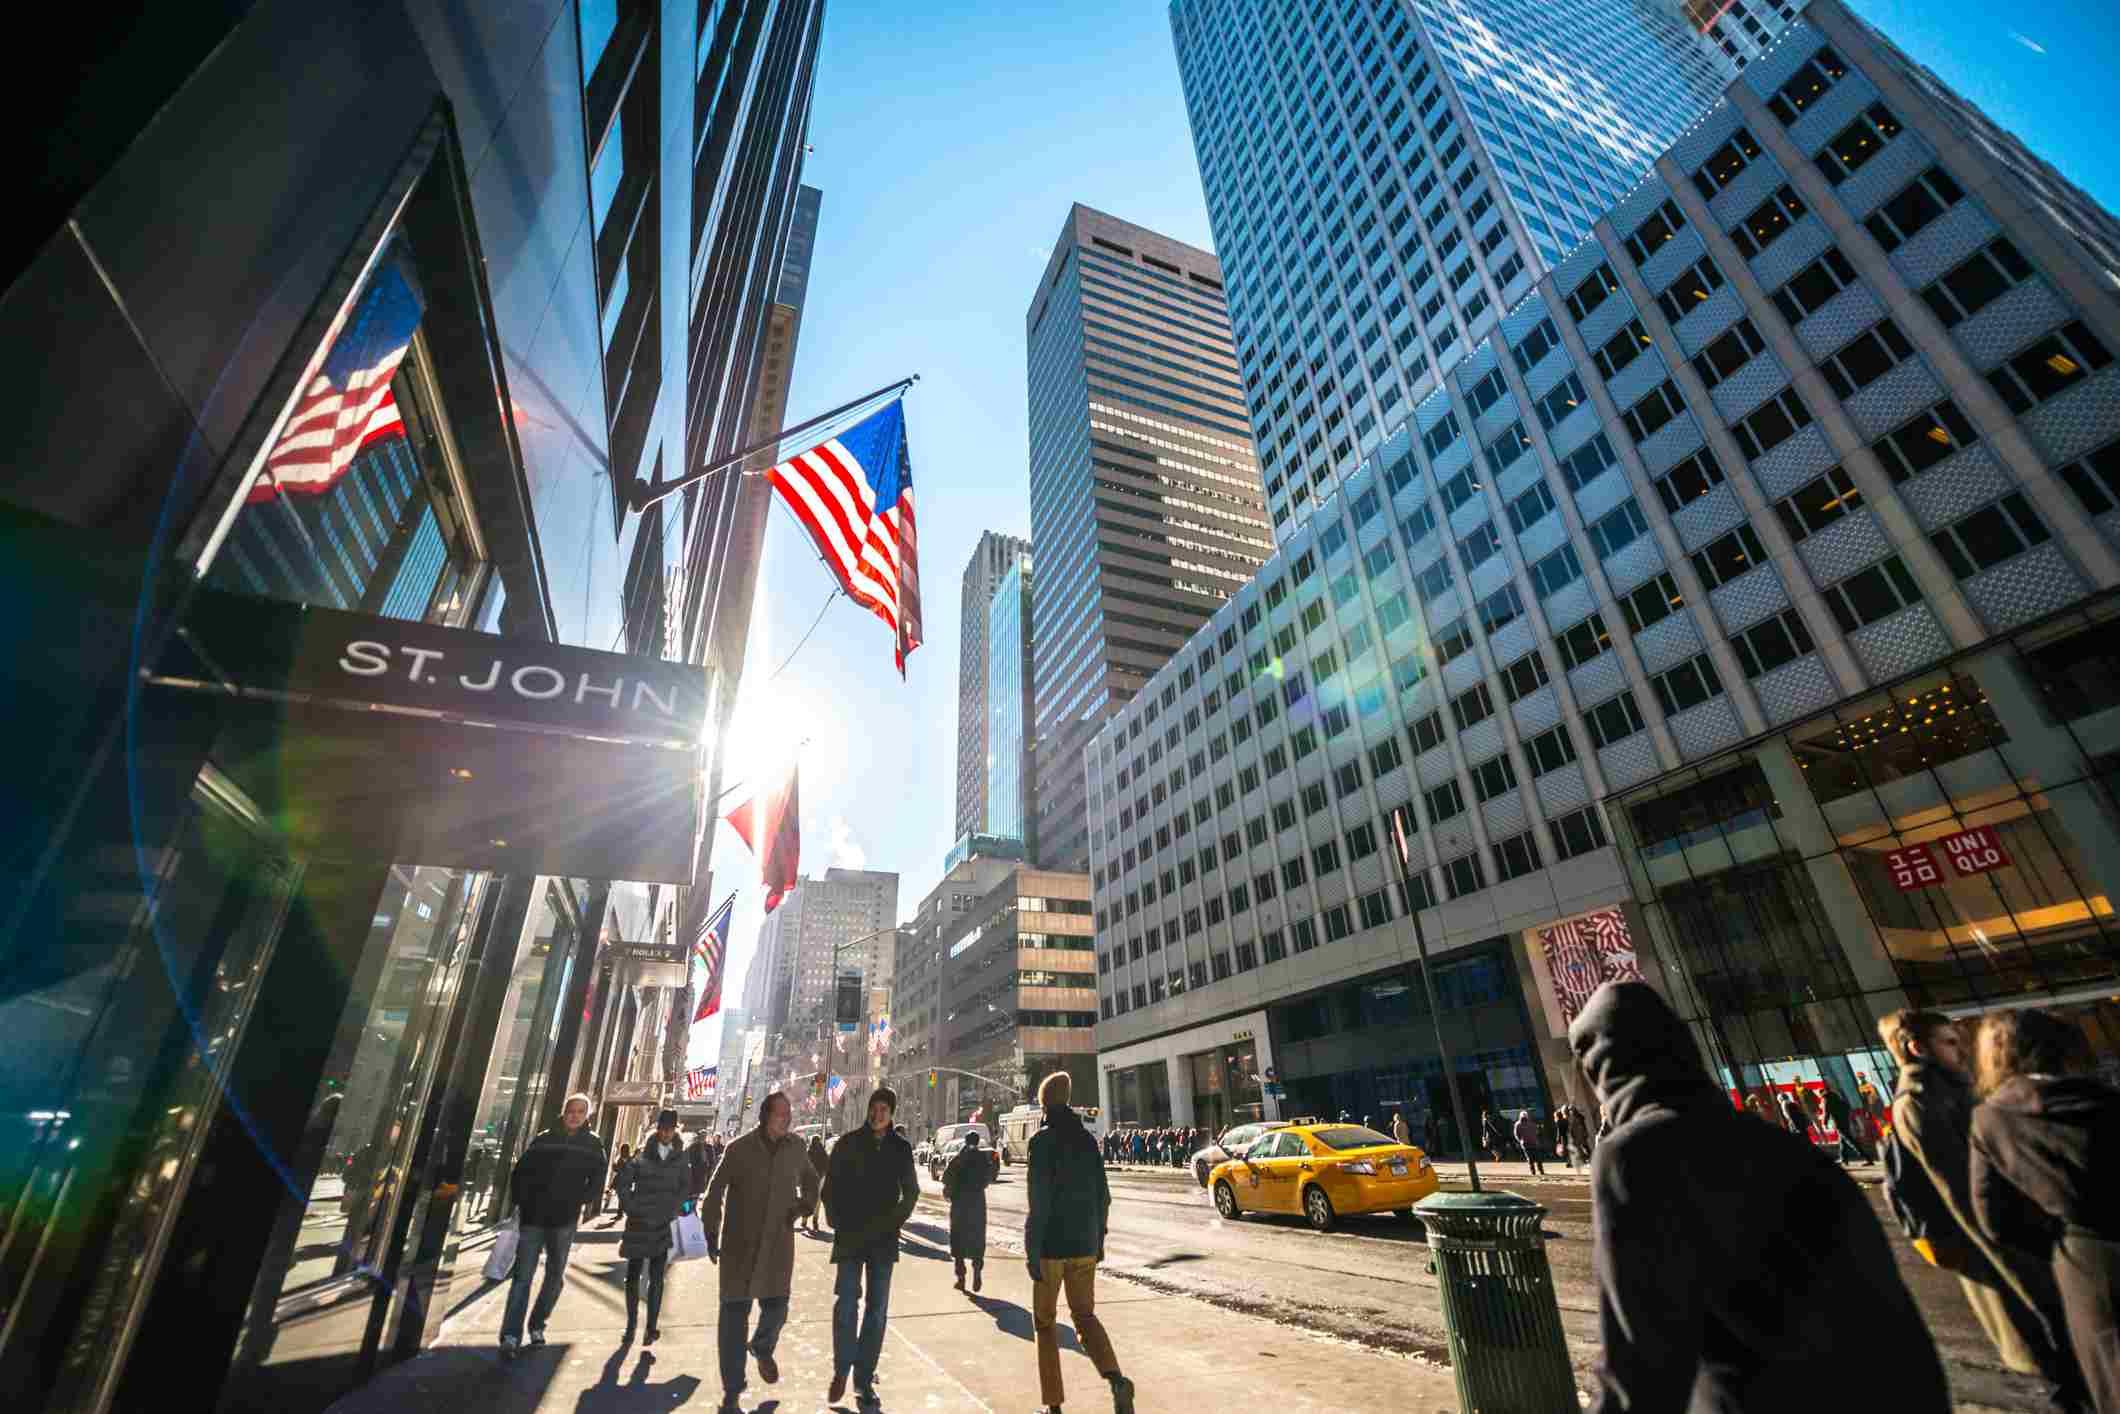 St. John 5th ave NYC